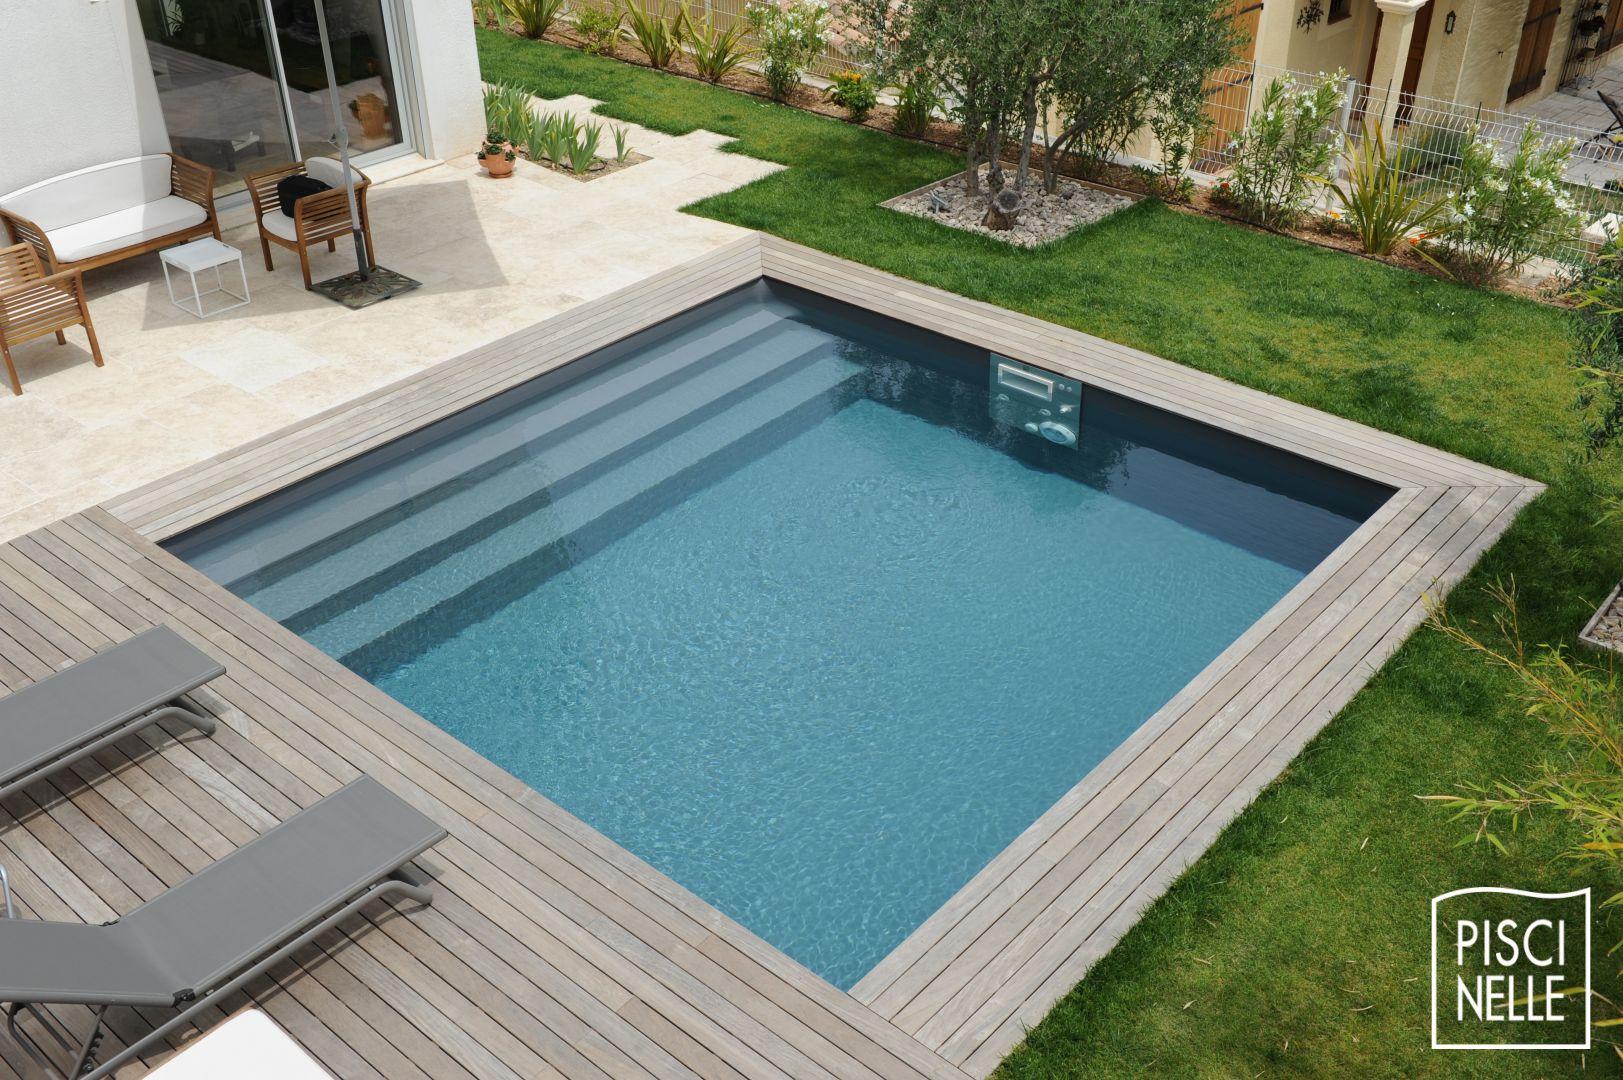 Diaporama de photos de piscines design et contemporaines ...